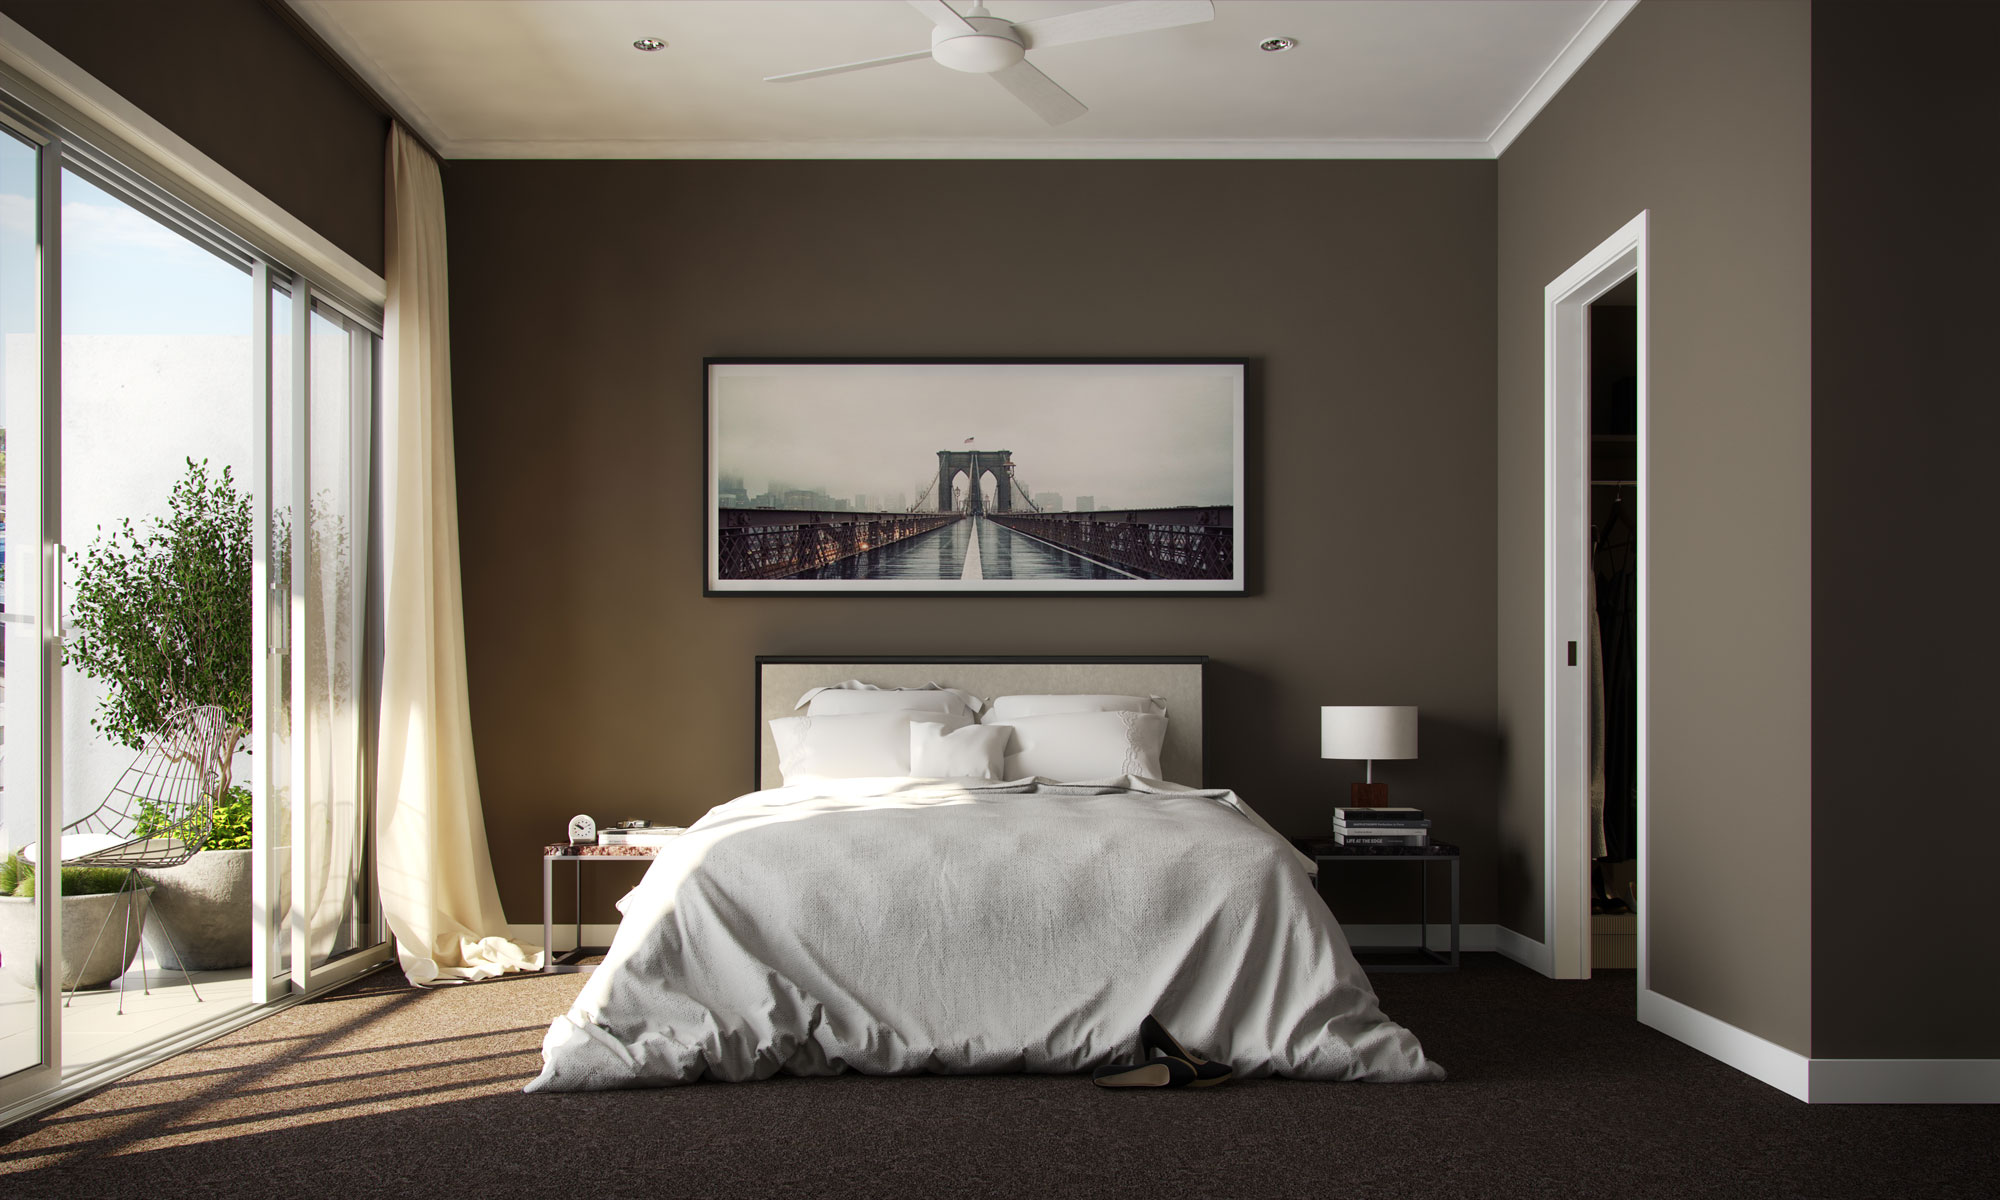 Chermside - Hamilton bed